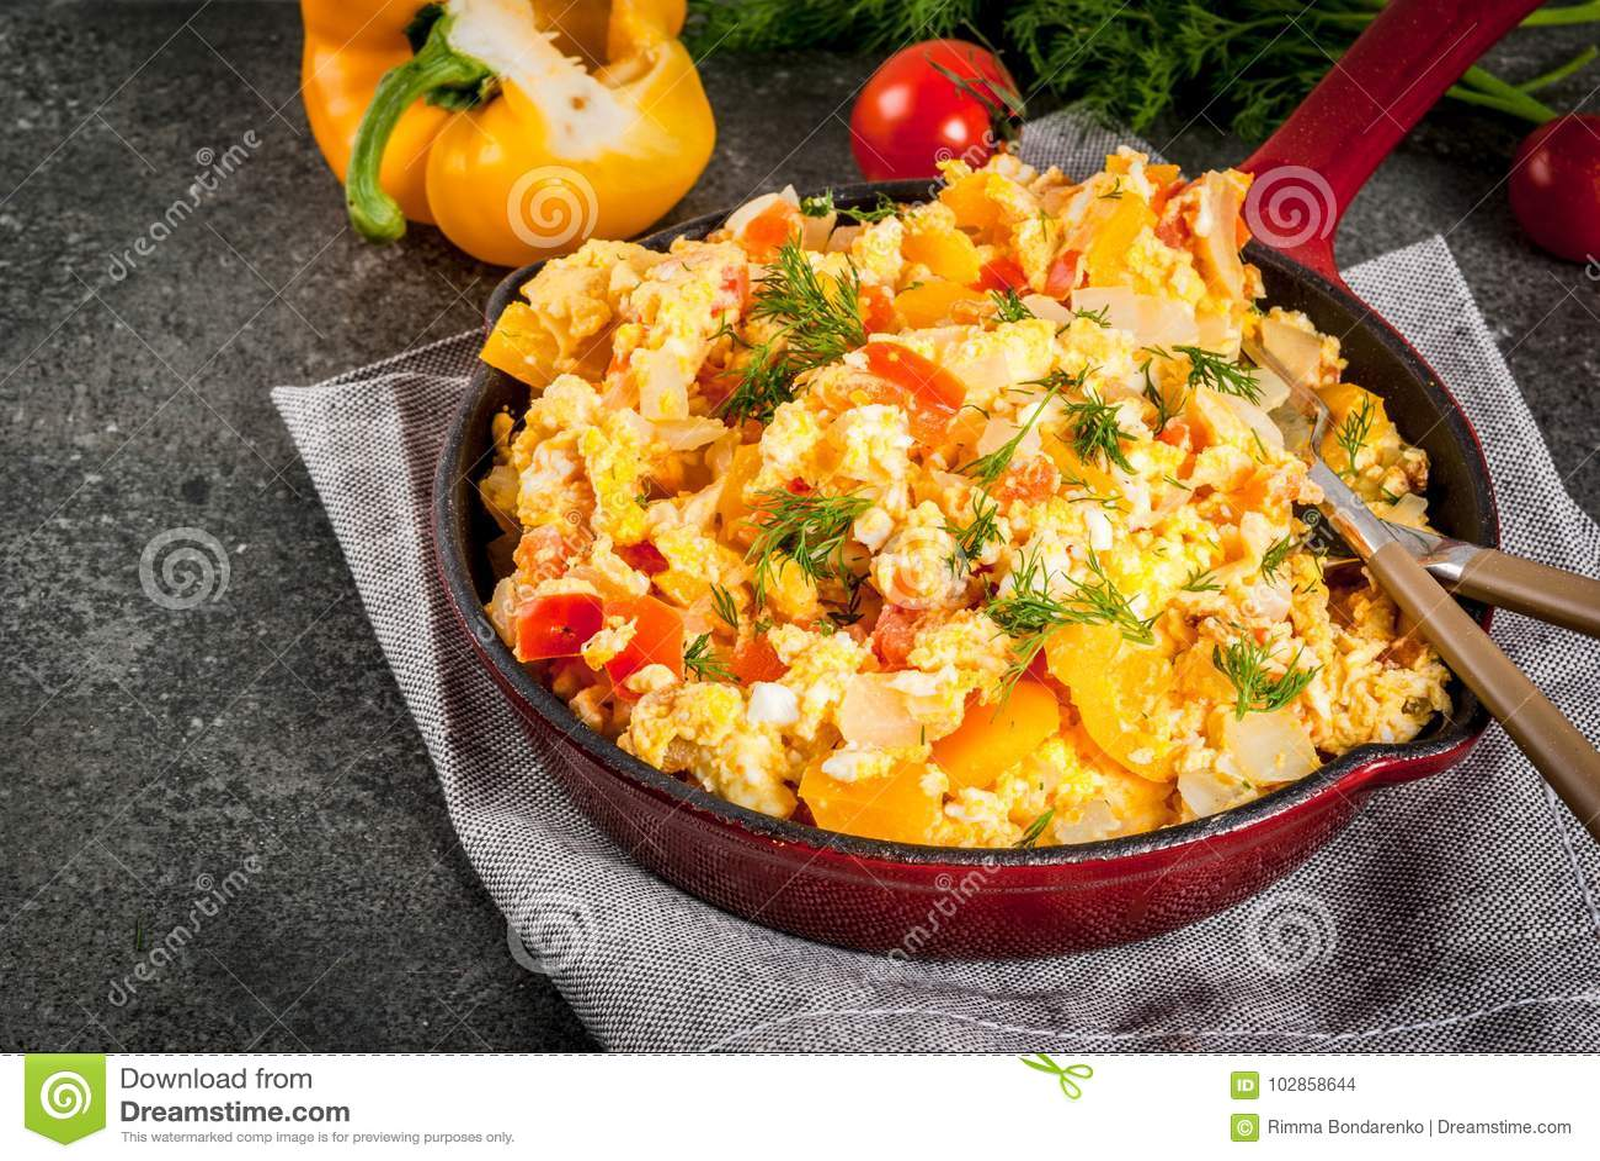 Mexicaanse voedselrecepten Revoltillo DE Huevos, Roereieren La Dominicana